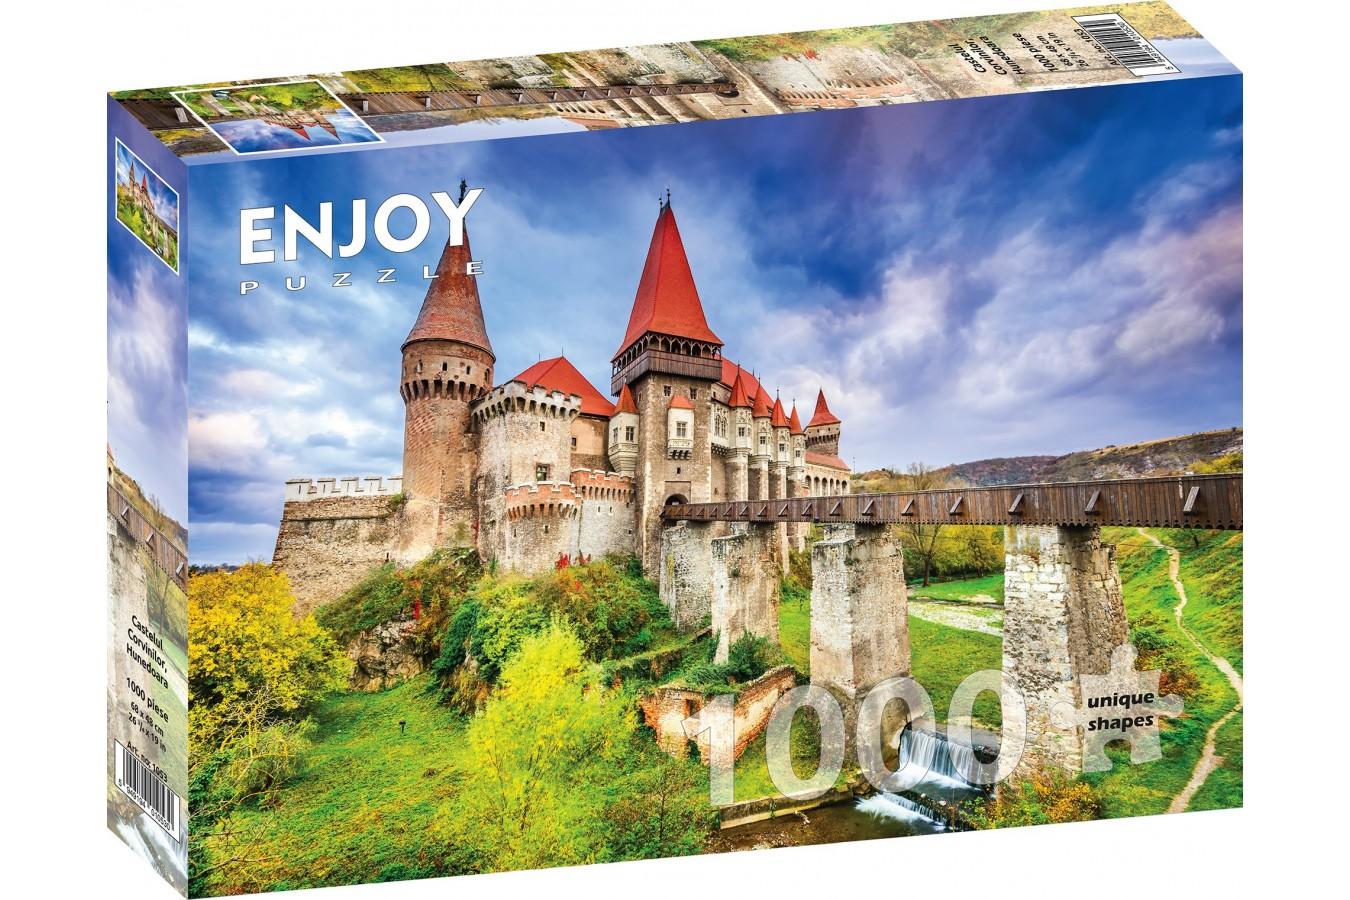 Puzzle 1000 piese - Castelul Corvinilor, Hunedoara (Enjoy-1053)